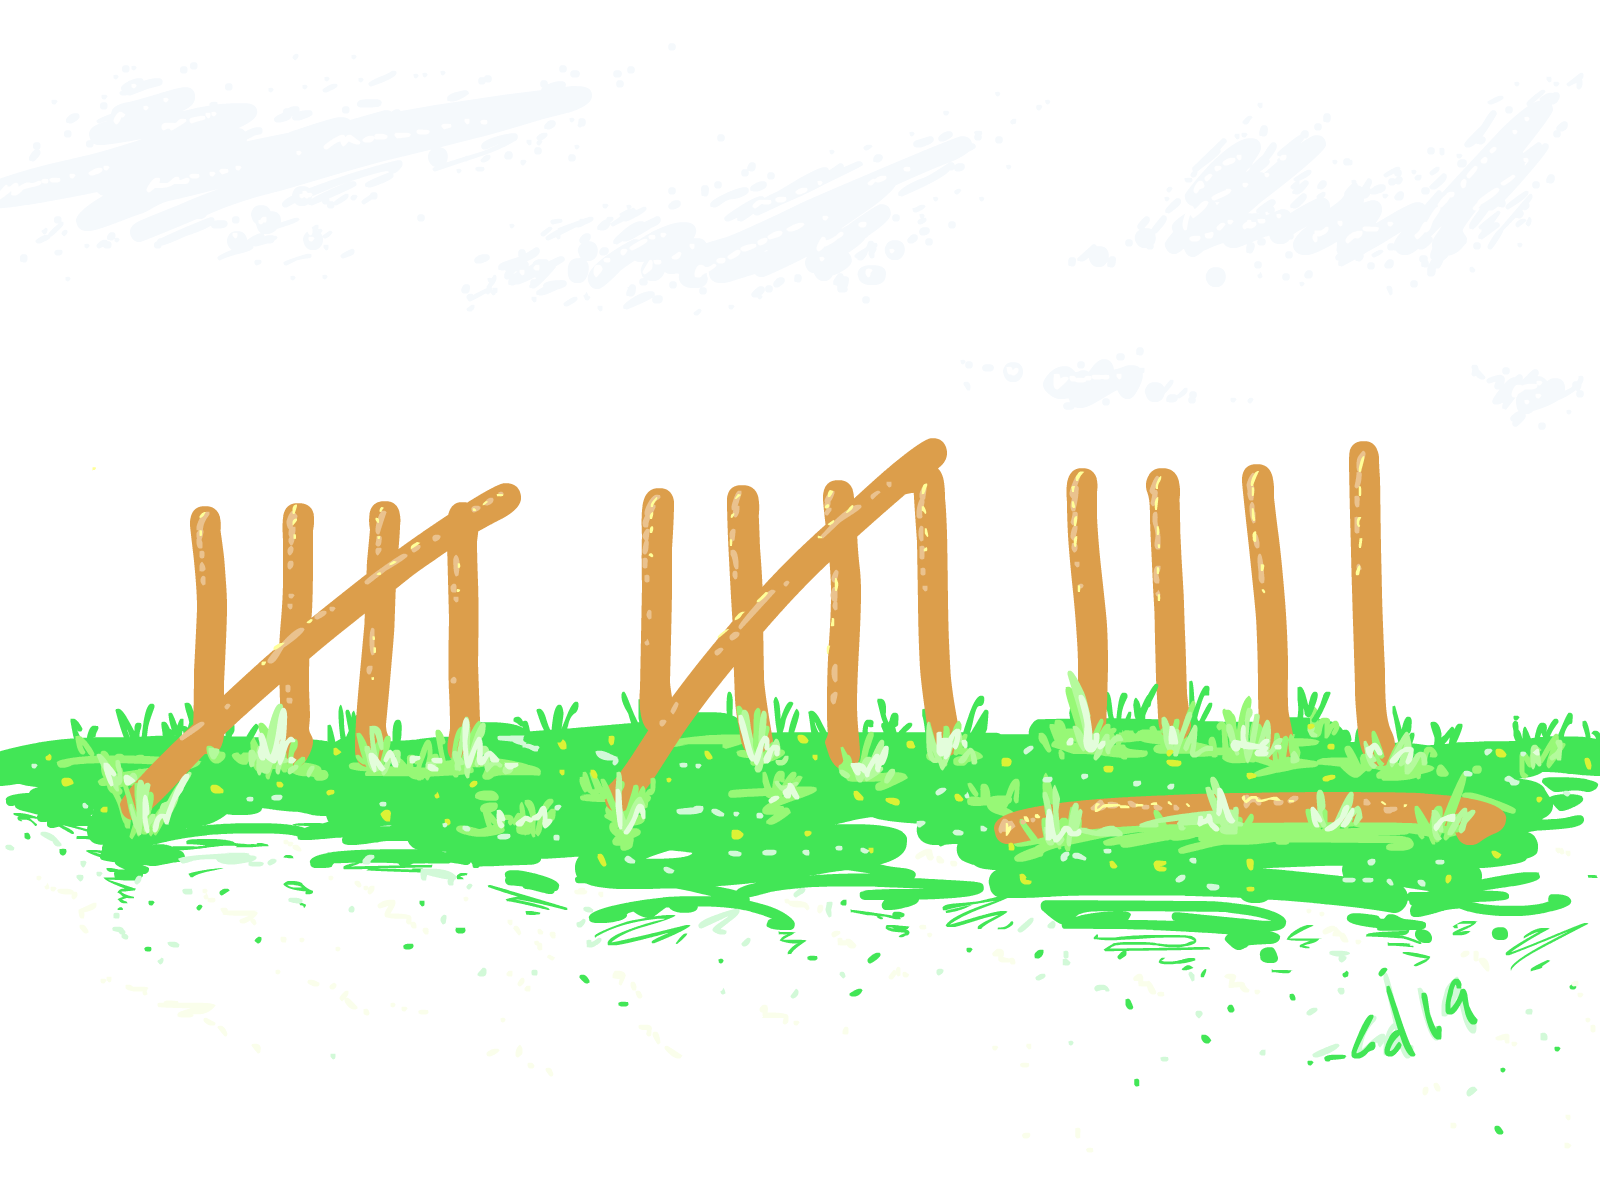 Inktober #15 Fences